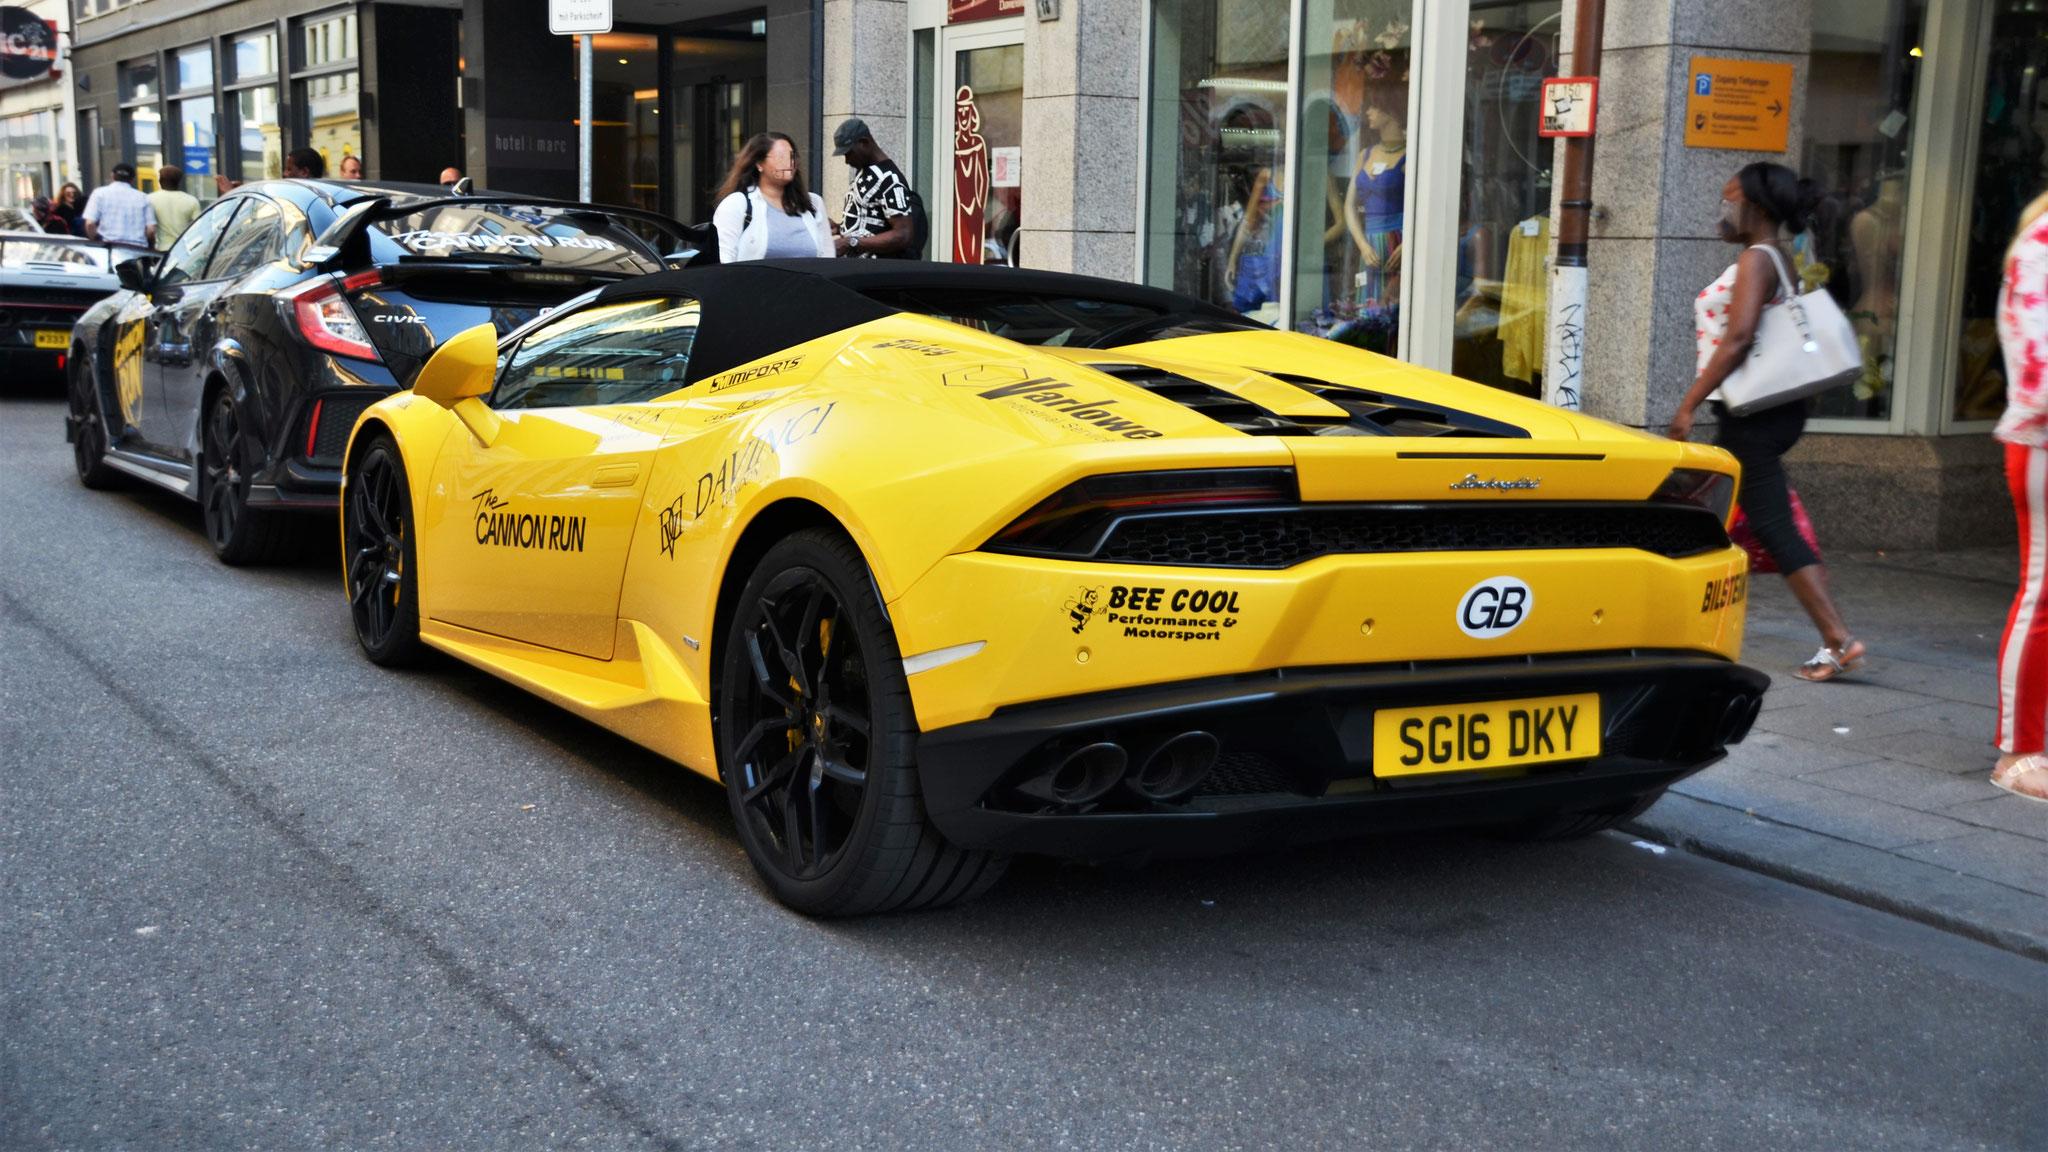 Lamborghini Huracan Spyder - SG16-DKY (GB)